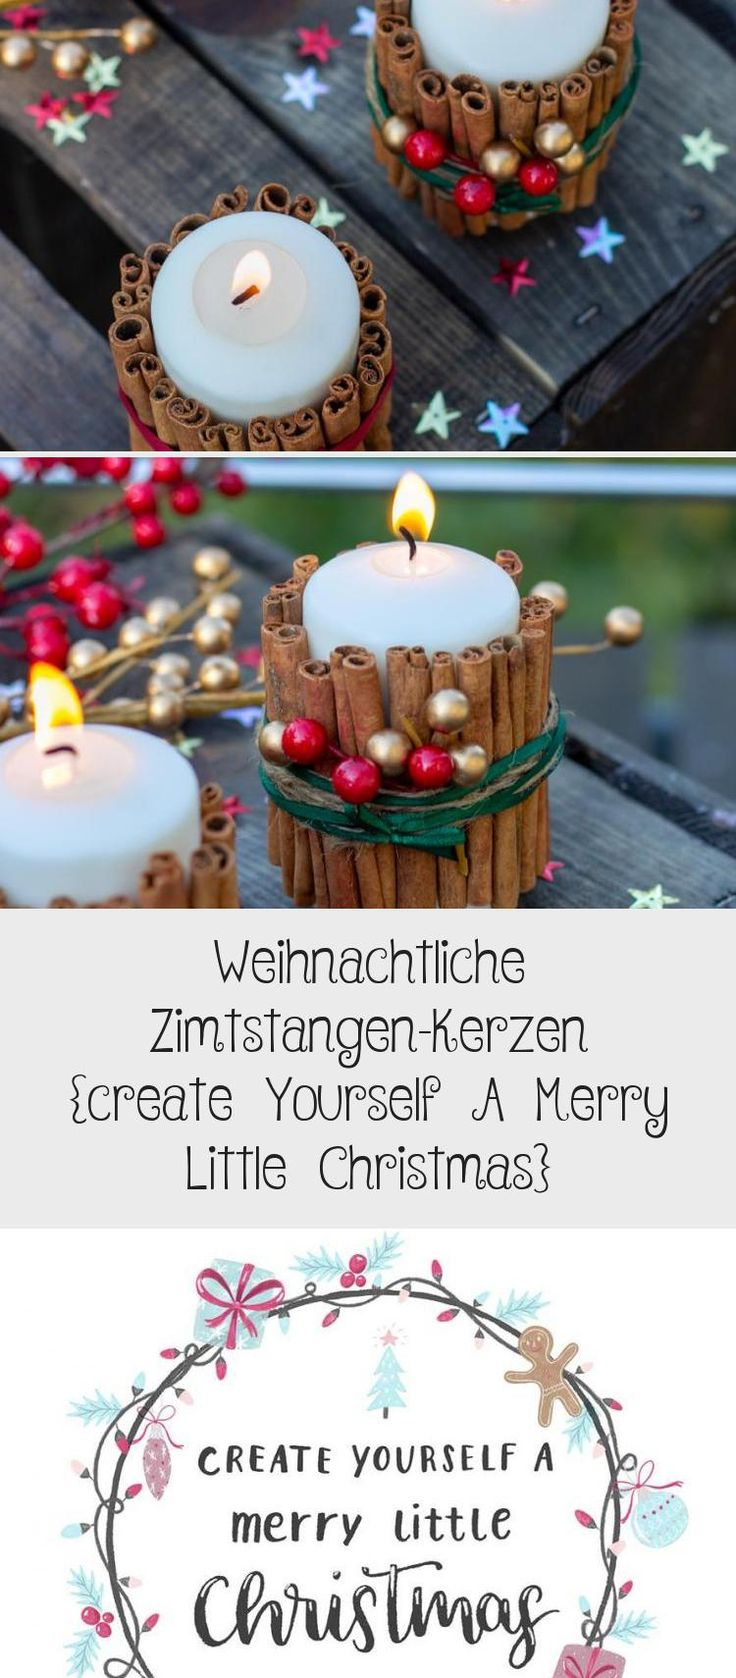 Weihnachtliche Zimtstangen Kerzen Create Yourself A Merry Little Christmas In 2020 Decor Table Decorations Diy